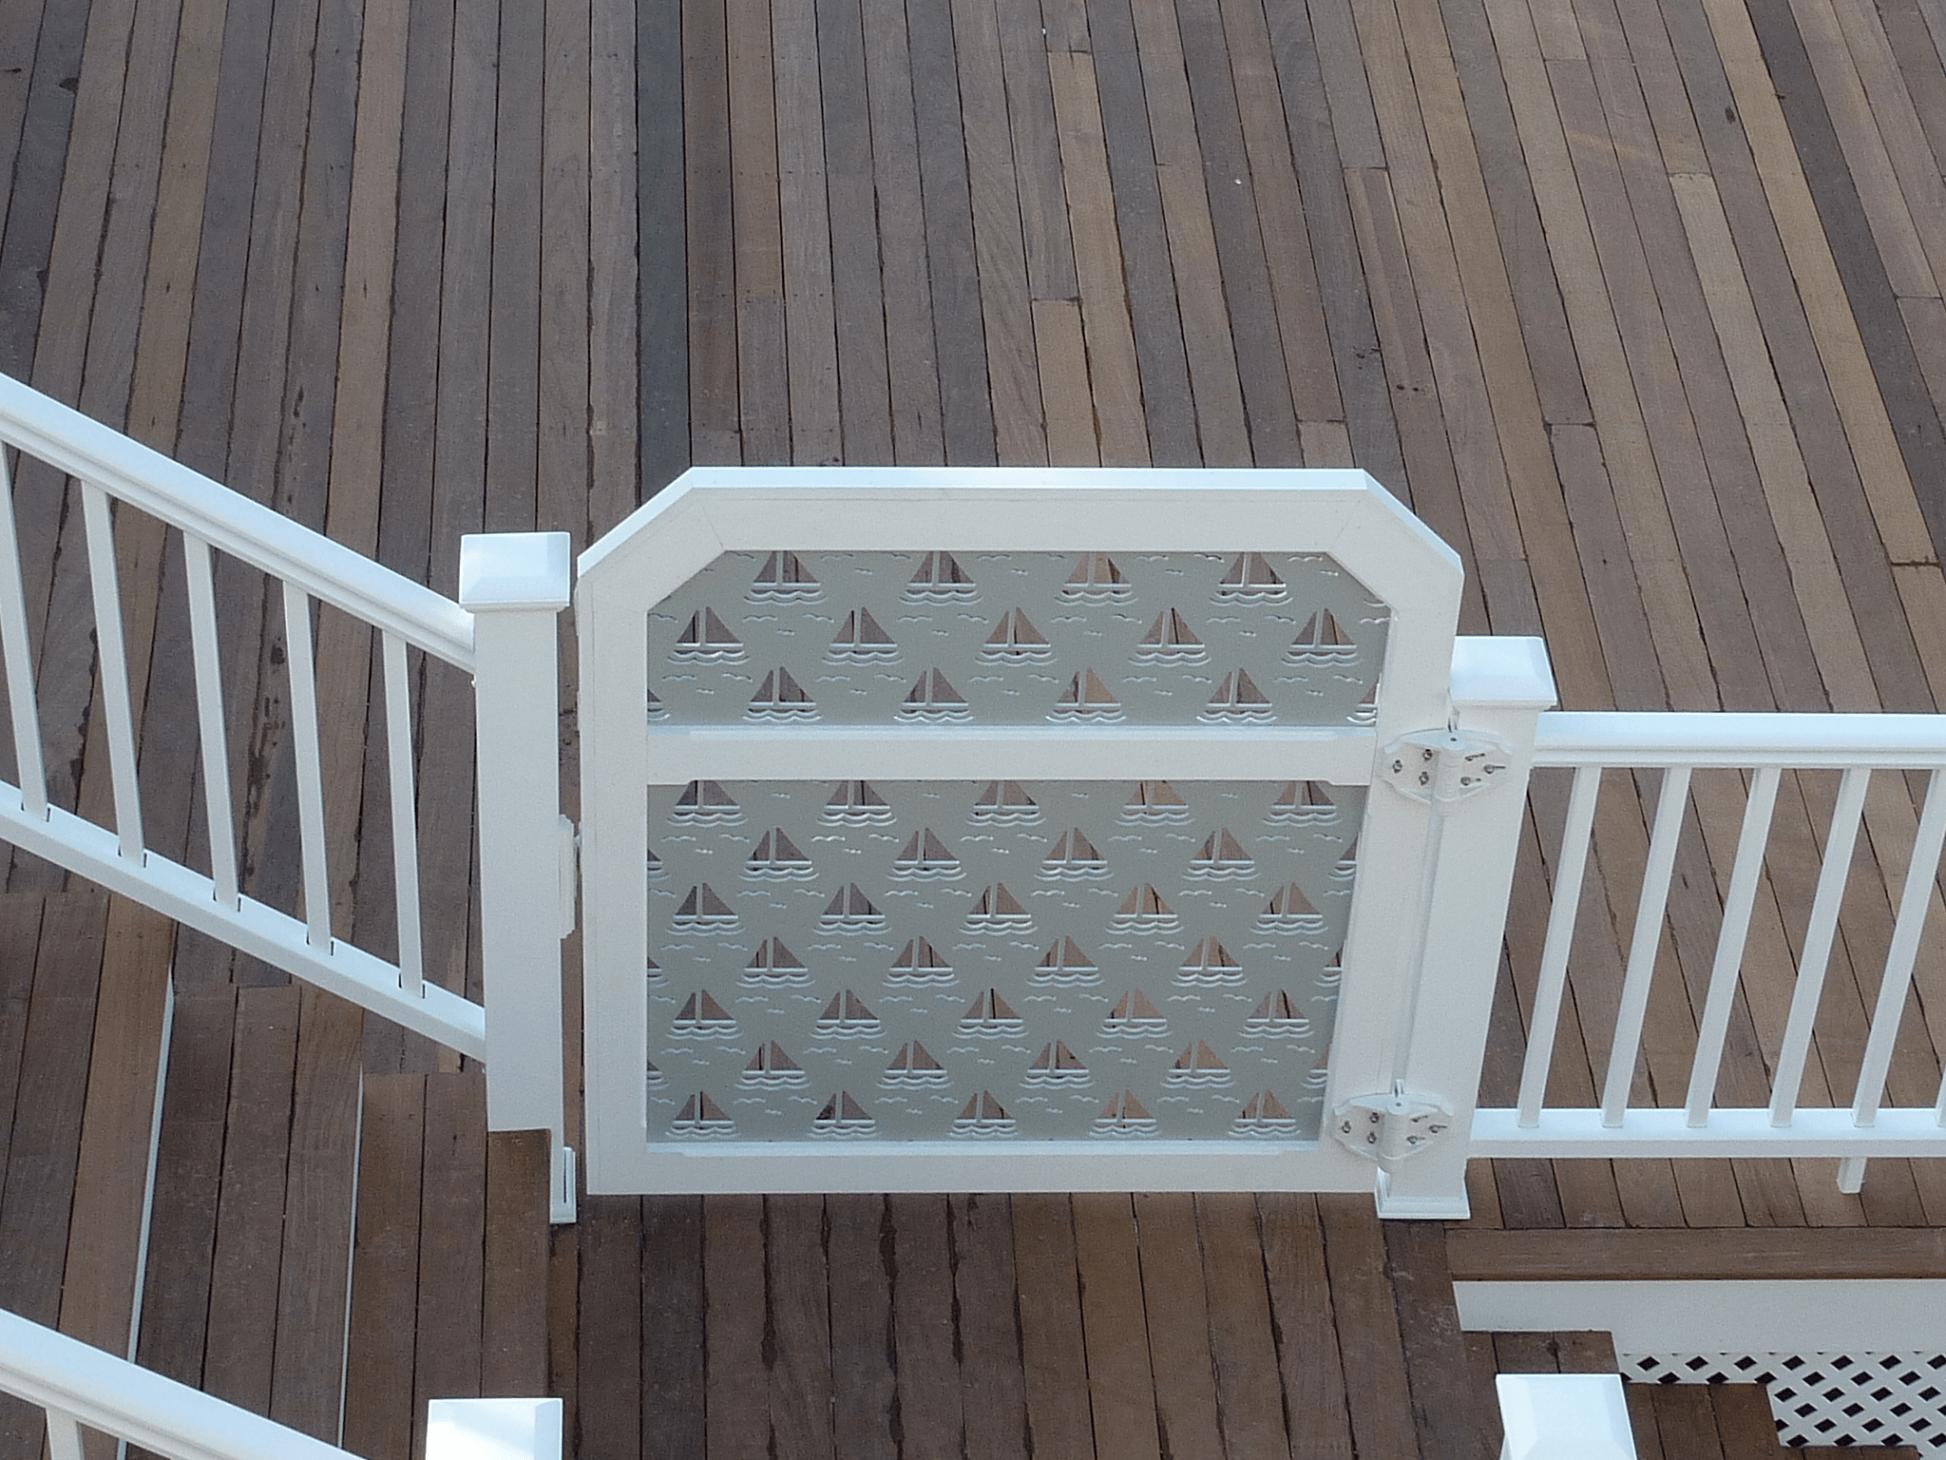 Vinyl porch gate